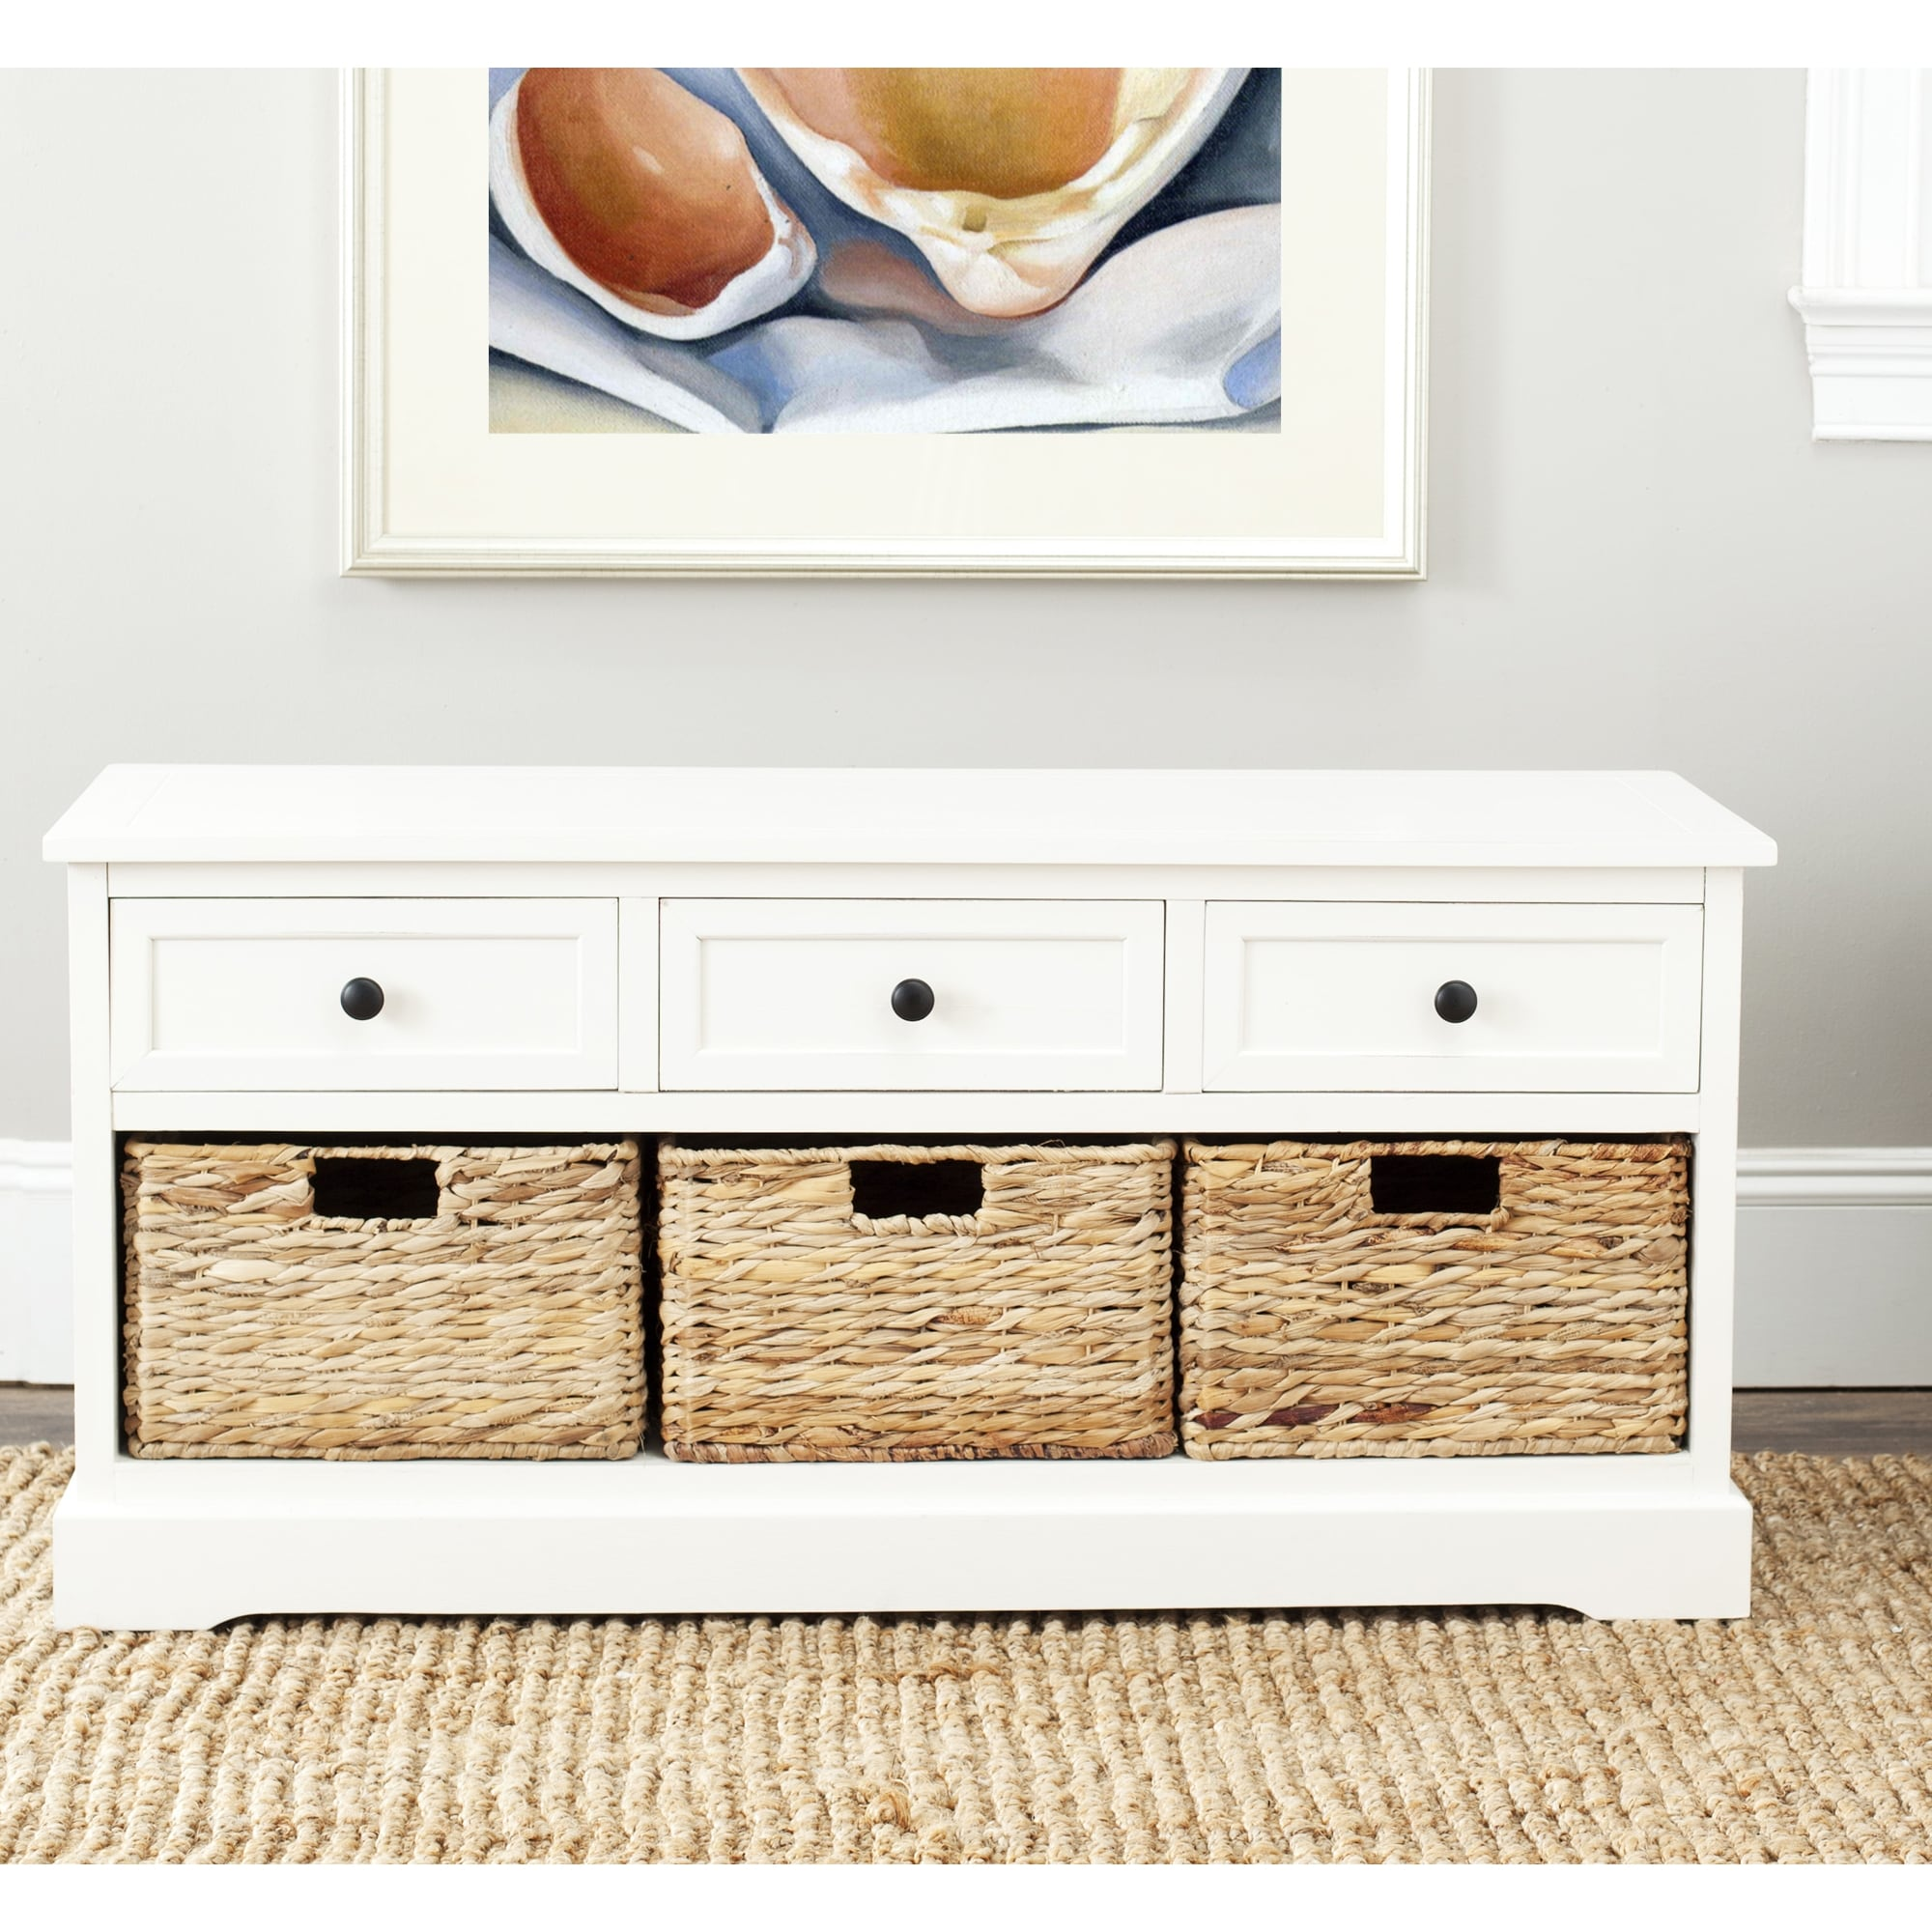 Safavieh Cape Cod Cream 3-drawer Storage Unit at Sears.com